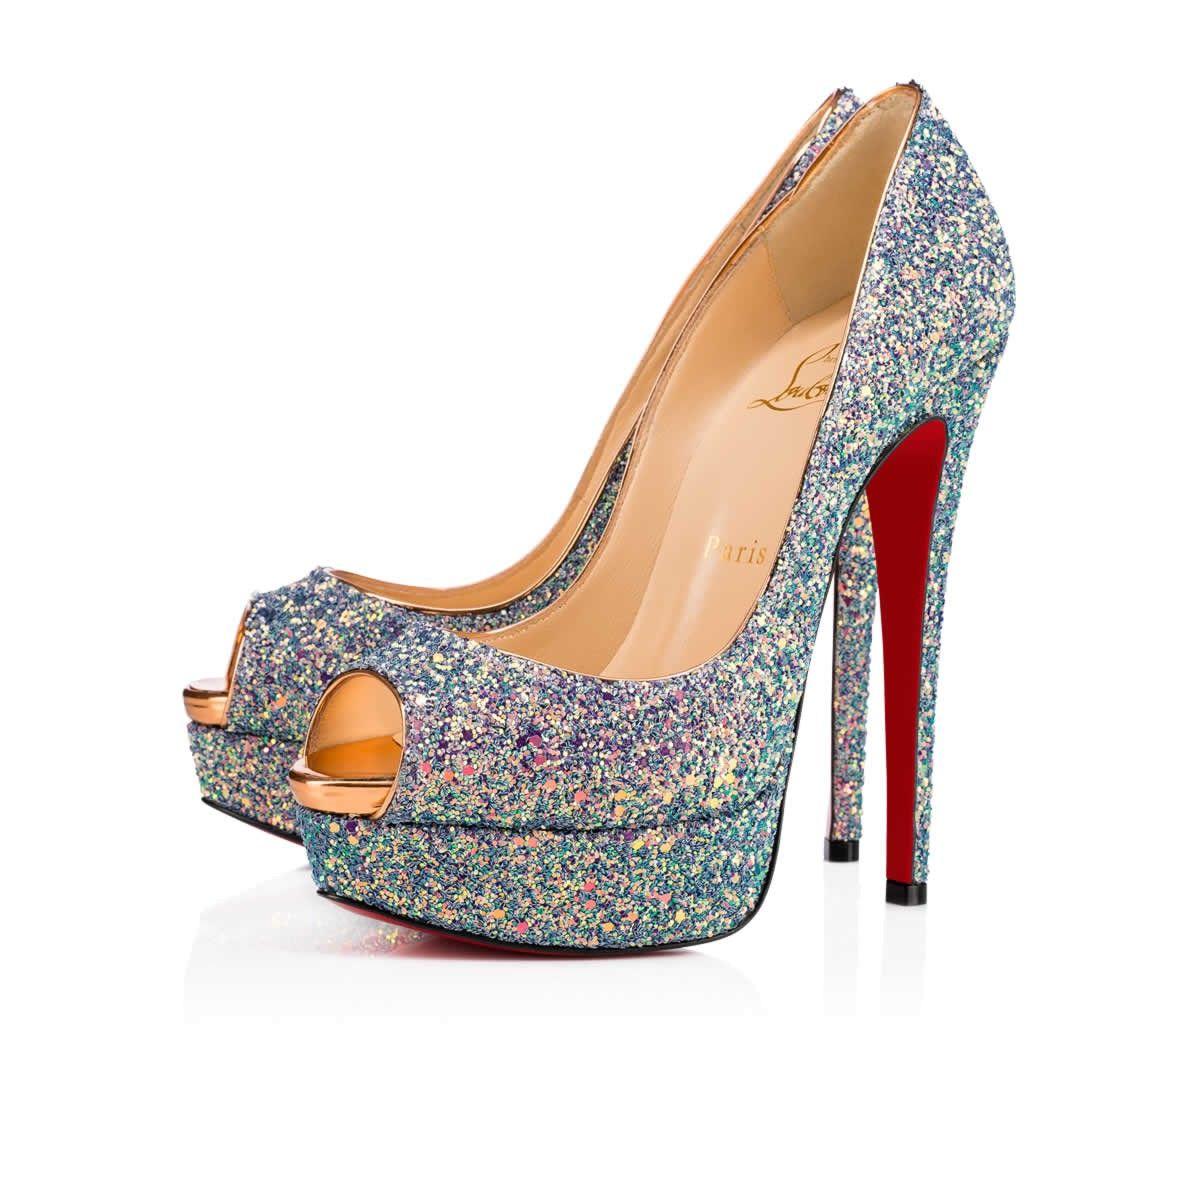 Lady Peep Dragonfly Glitter 150 ETINCELLE/COPPER Glitter - Women Shoes - Christian  Louboutin